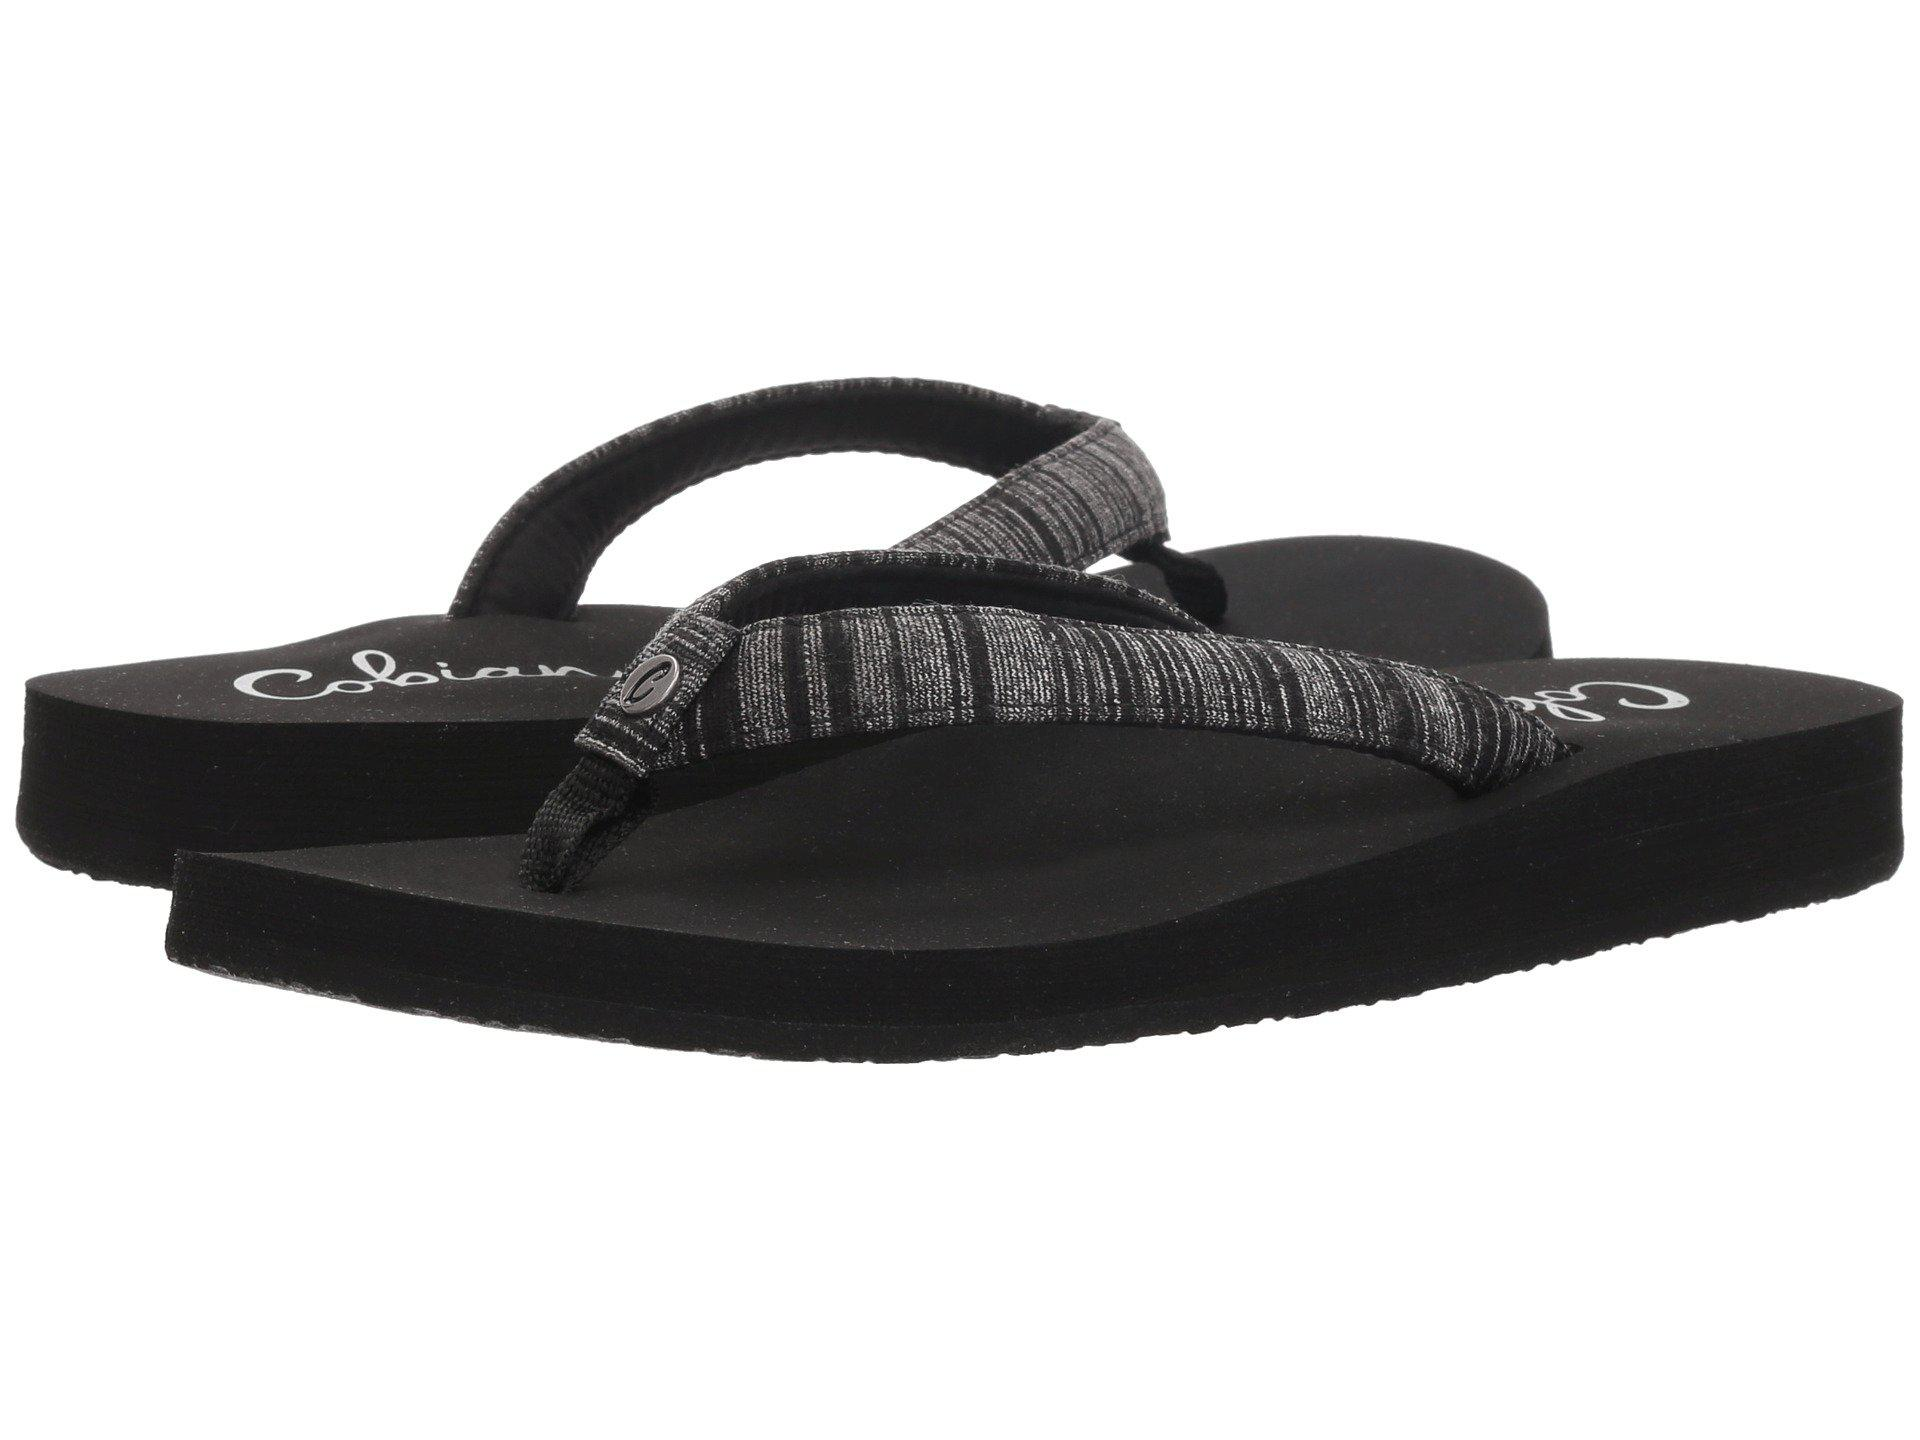 f74b50da75873 Lyst - Cobian Fiesta Skinny Bounce (tan) Women s Sandals in Black